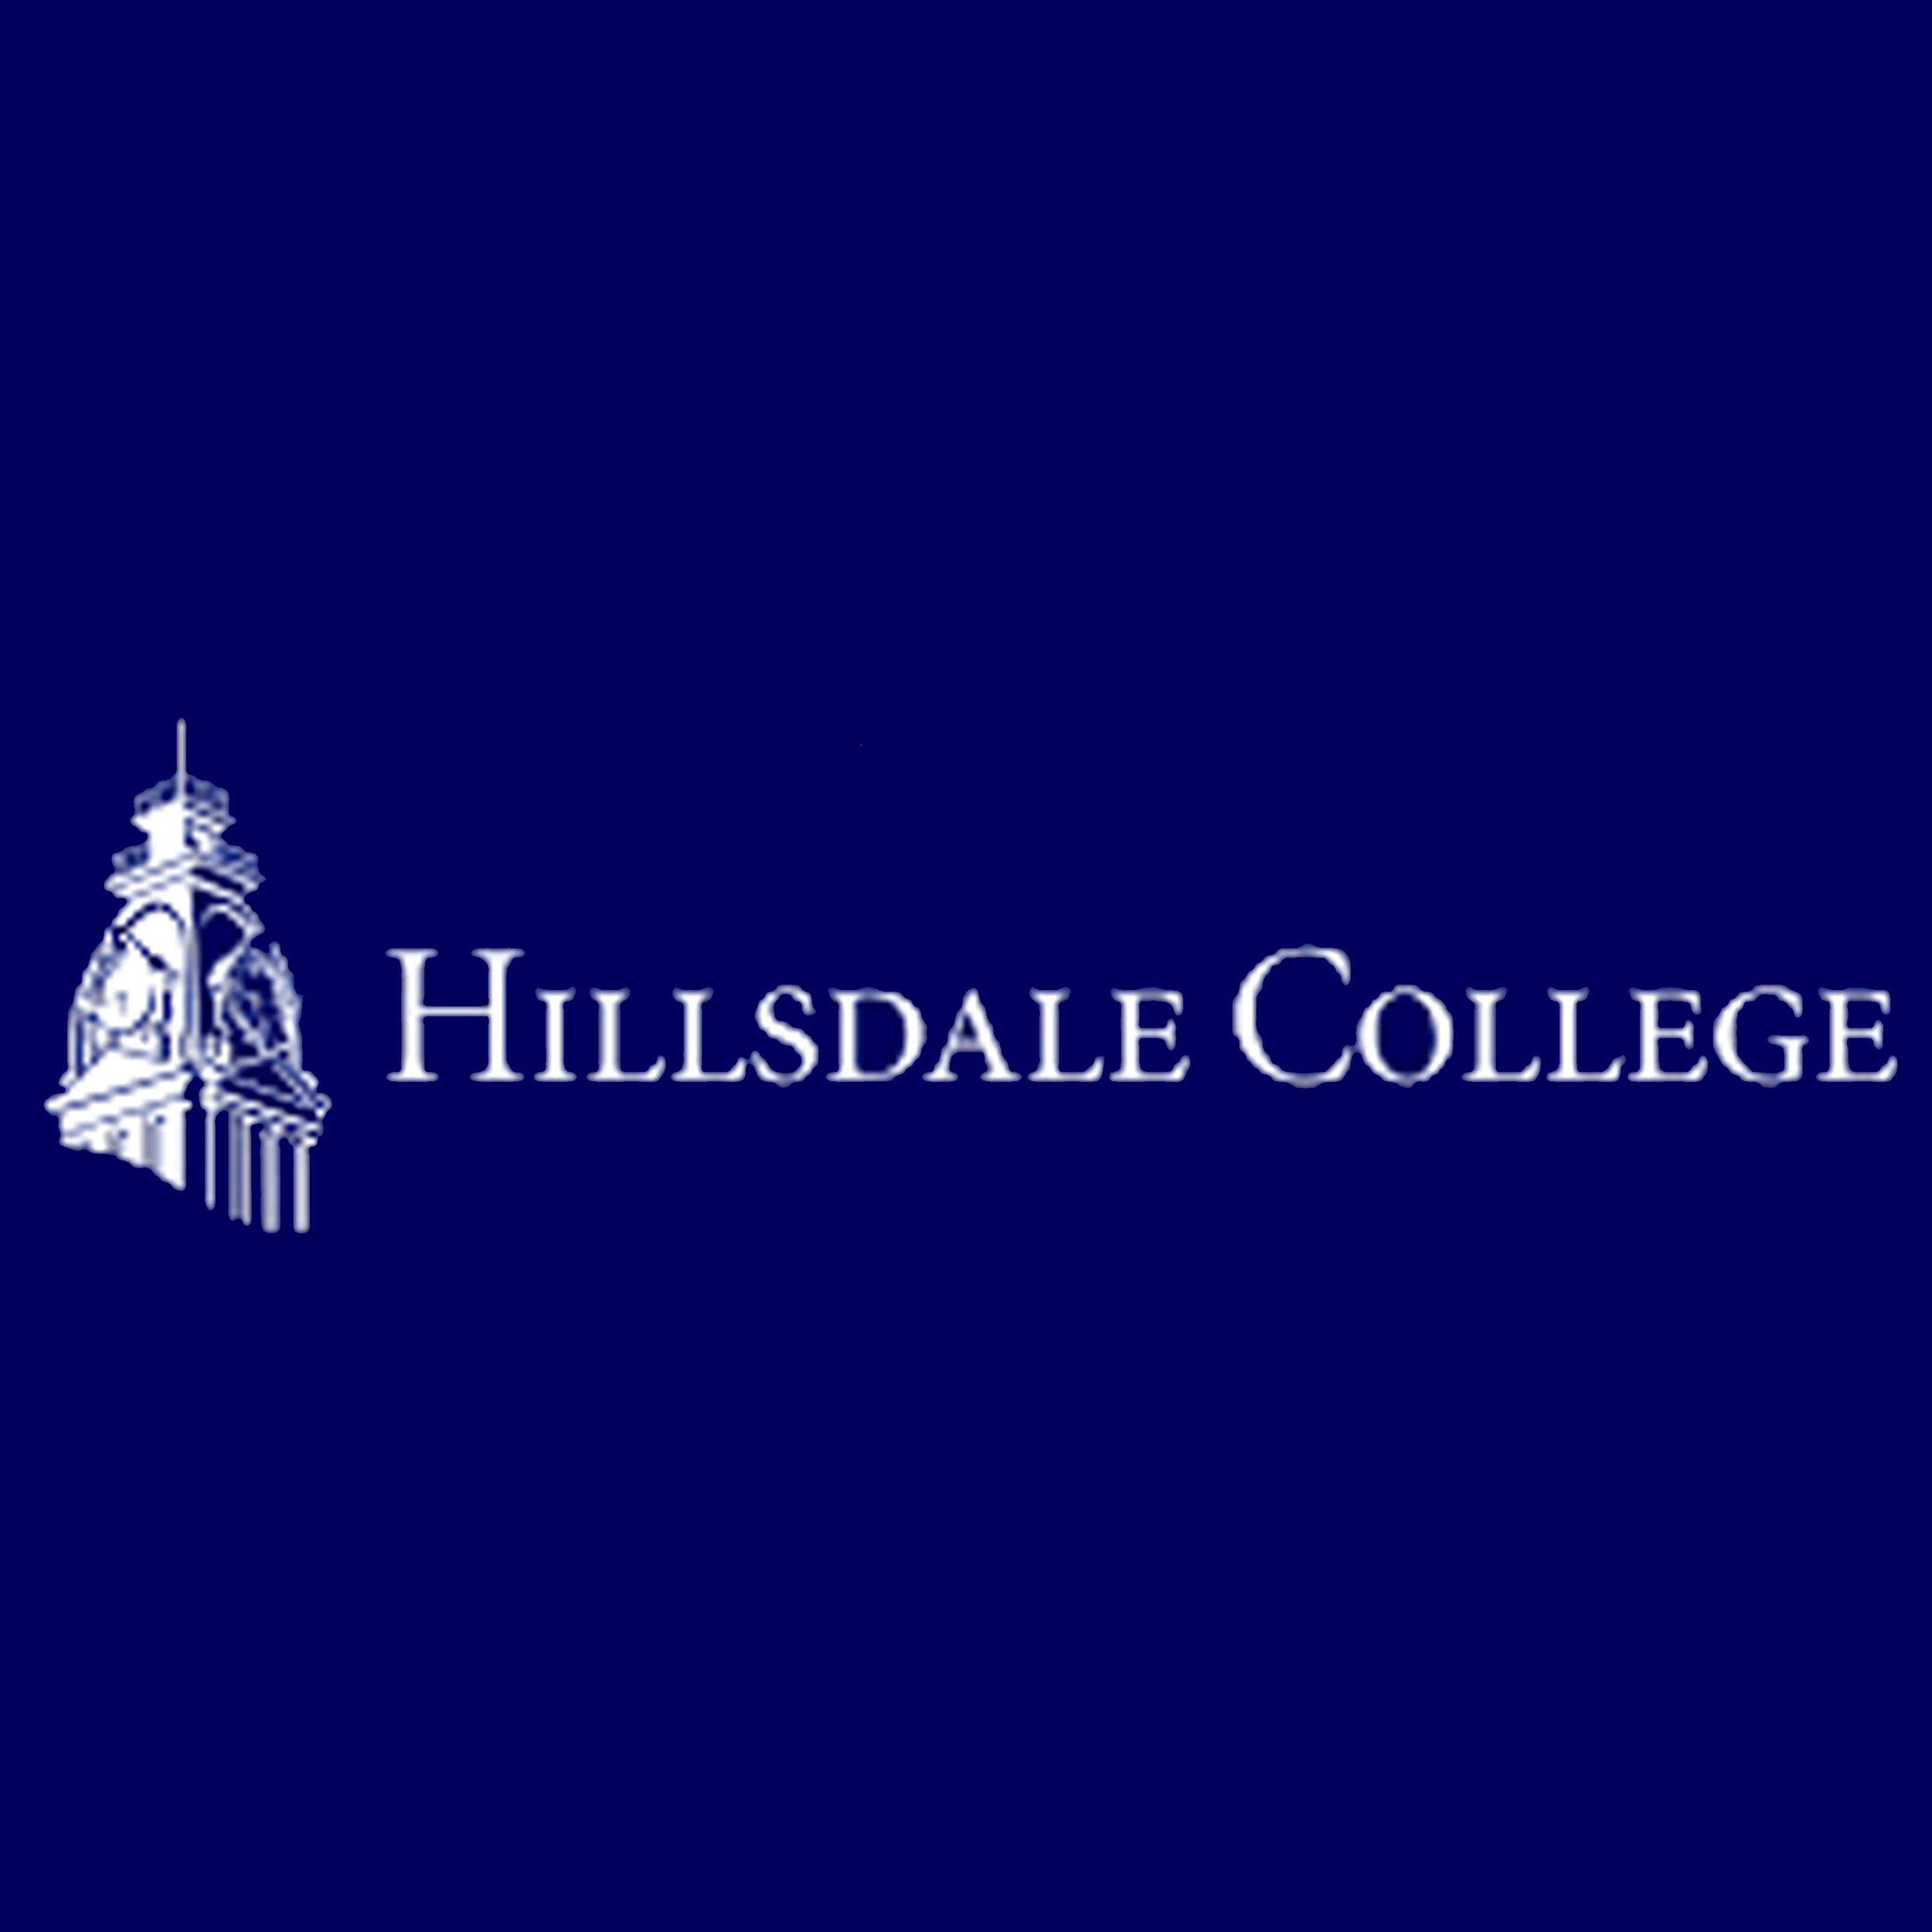 hillsdale.jpg